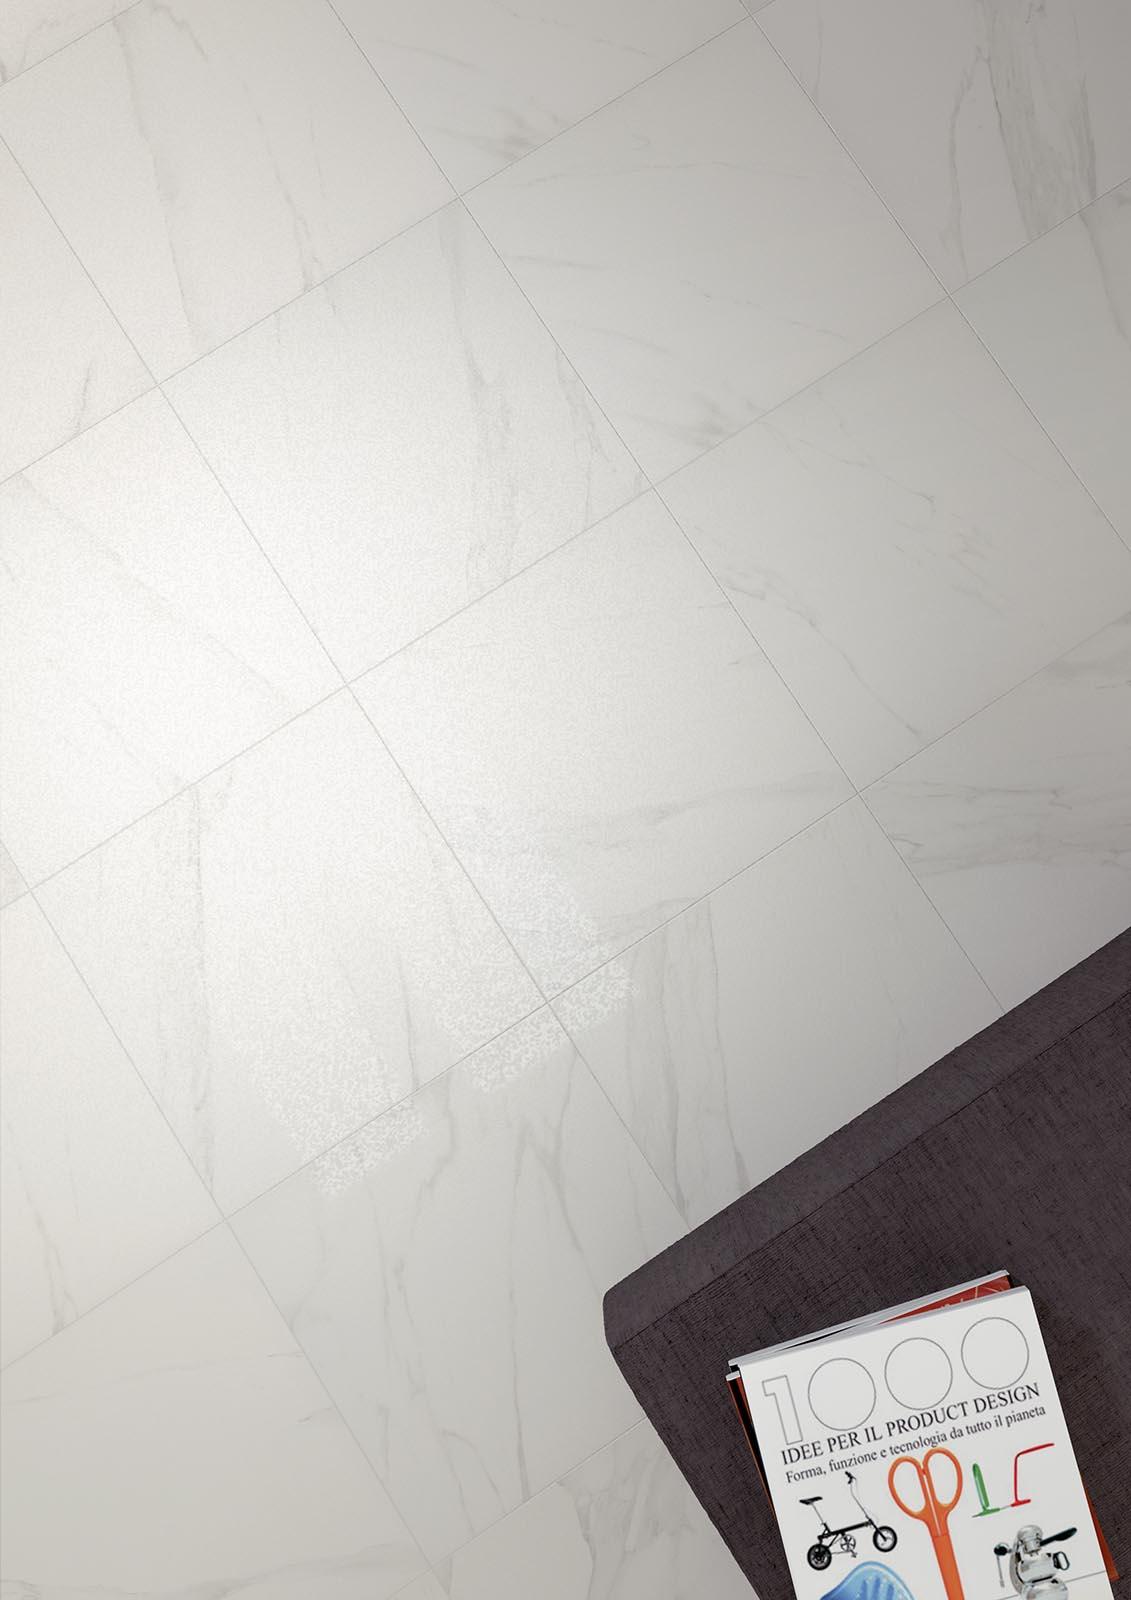 Marbleline marble effect stoneware marazzi marbleline ceramic tiles marazzi4891 doublecrazyfo Images